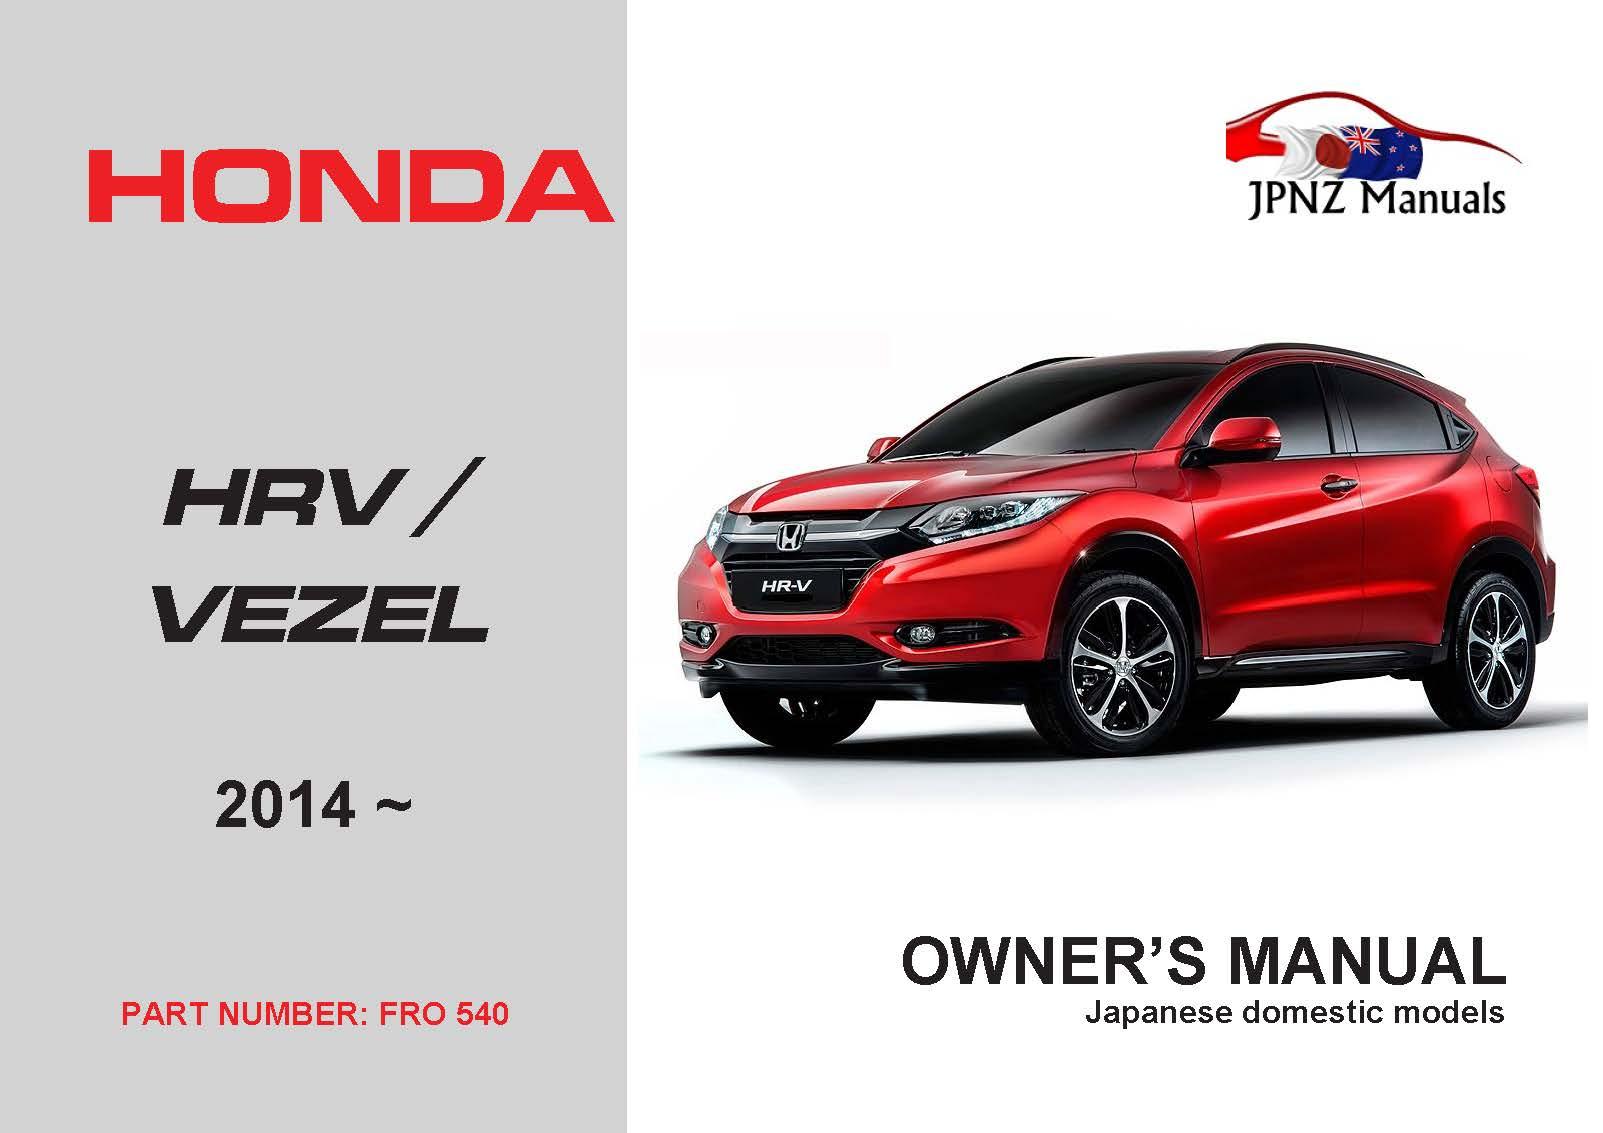 2014 Honda CR-V Owners Manual